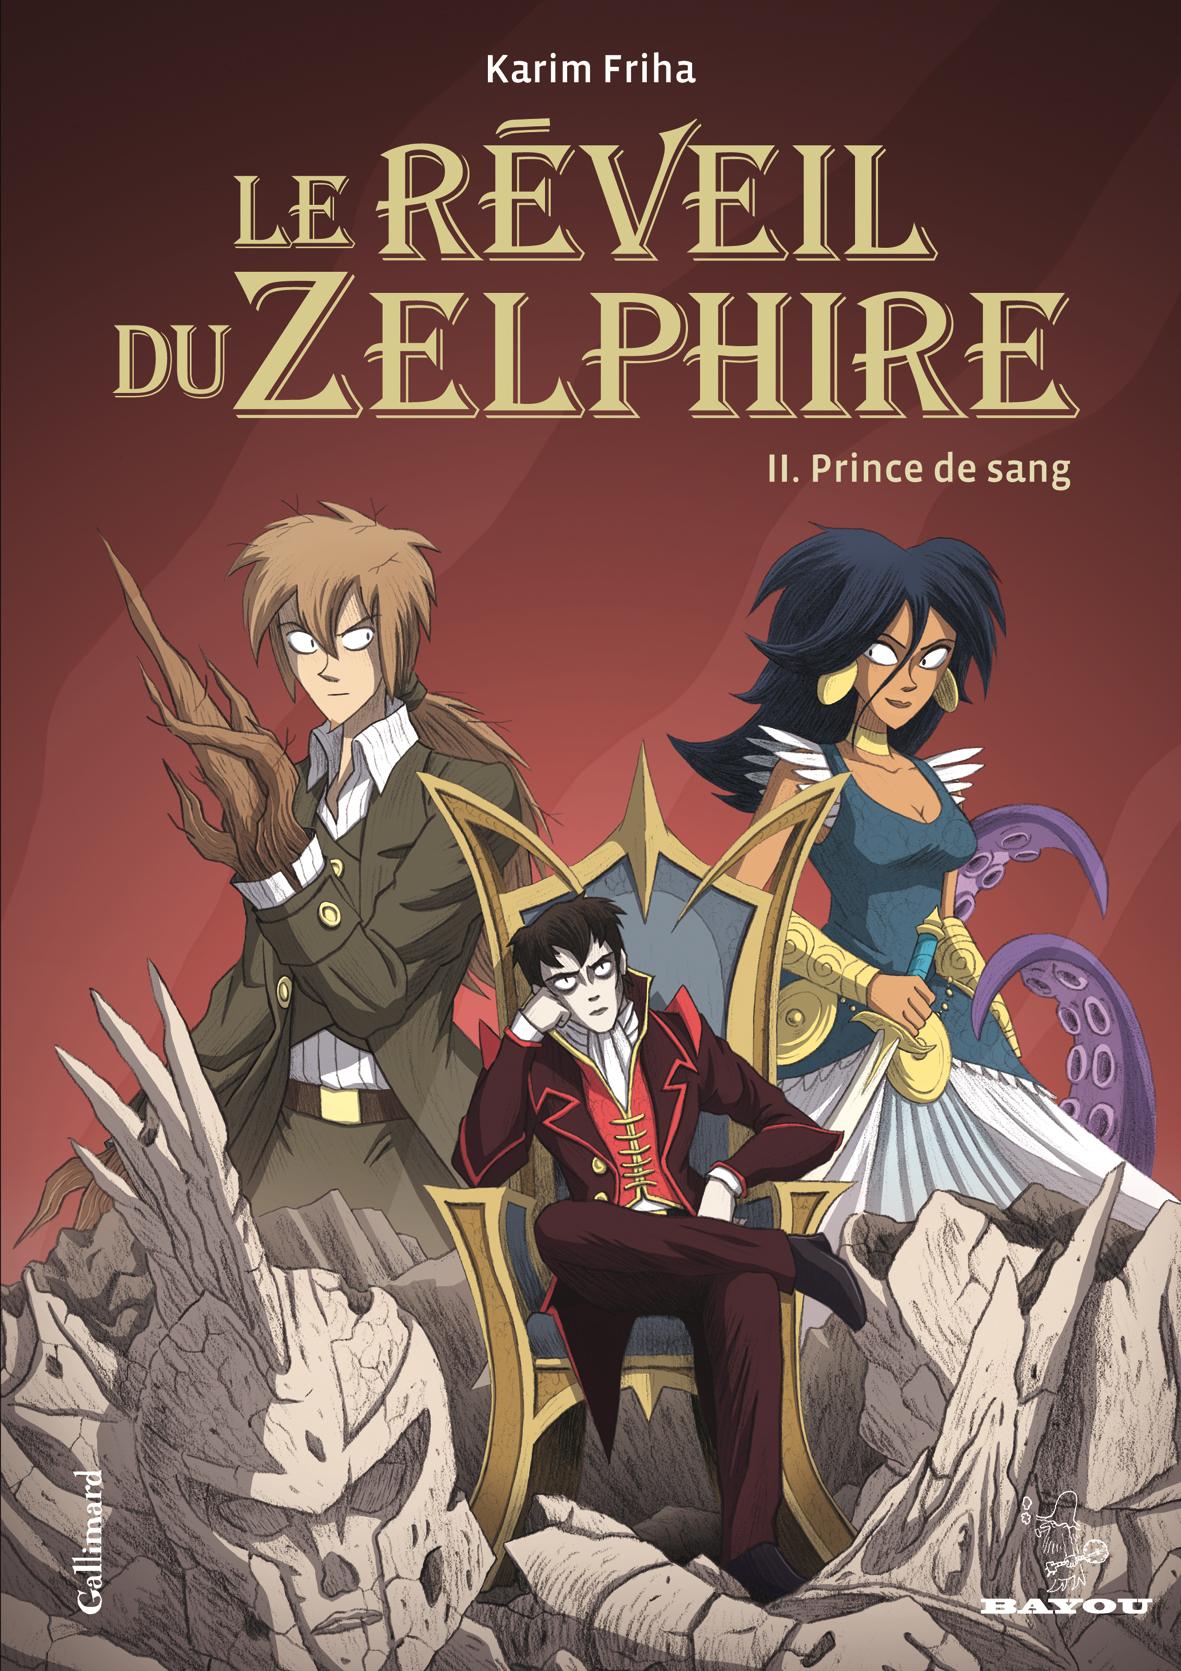 Reveil du zelphire - Prince de Sang - Karim Friha